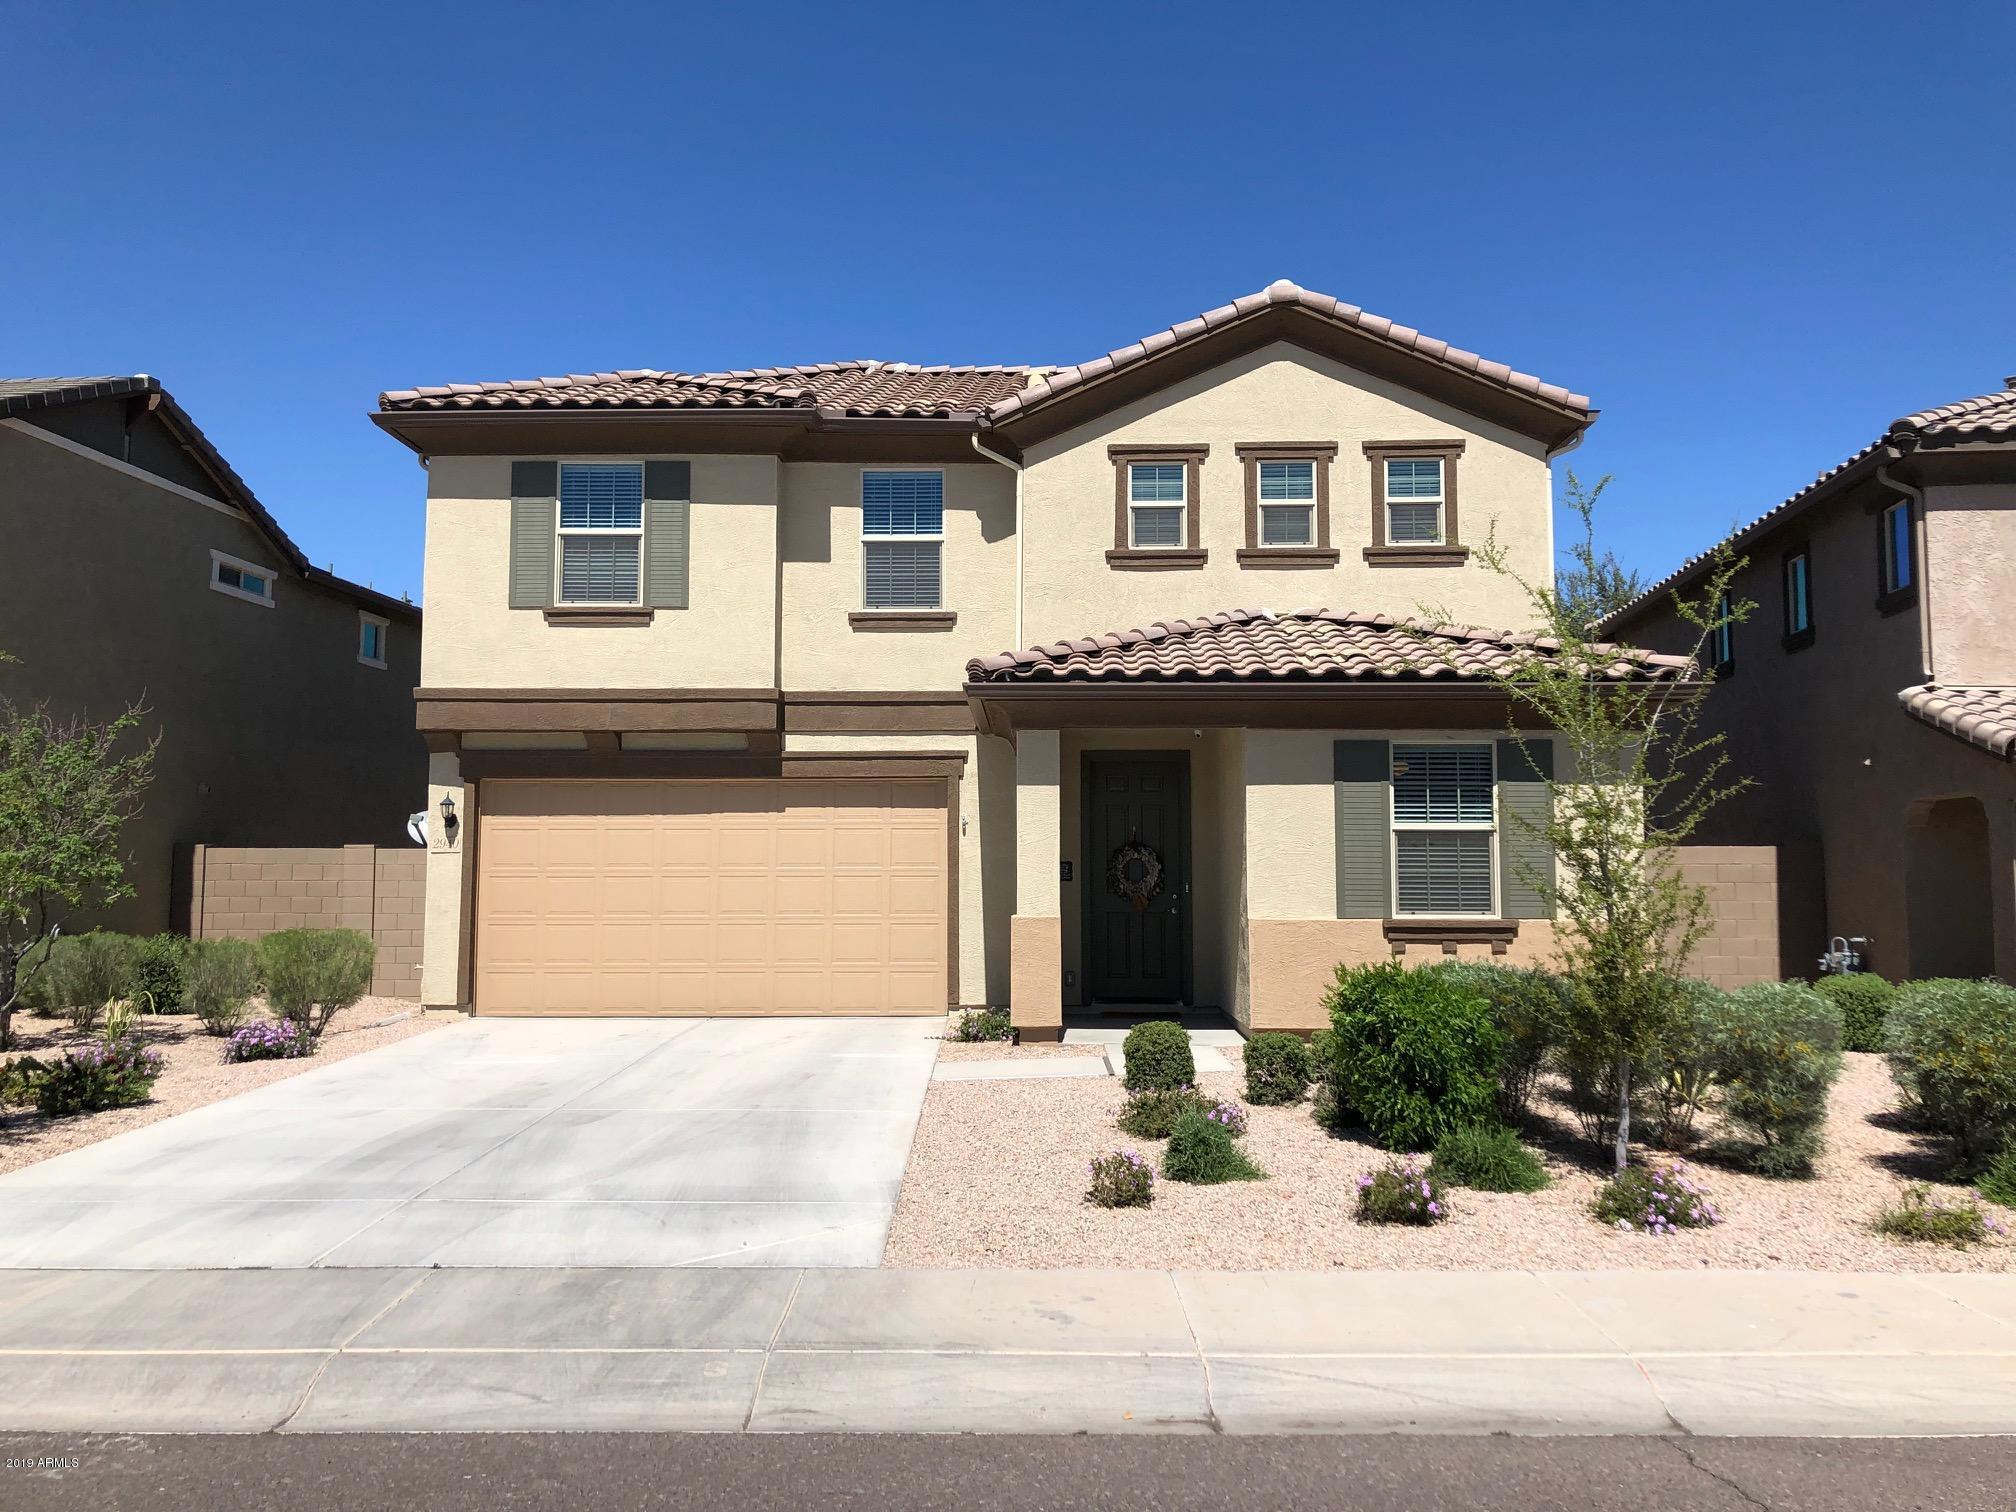 Photo of 2940 E DETROIT Street, Chandler, AZ 85225